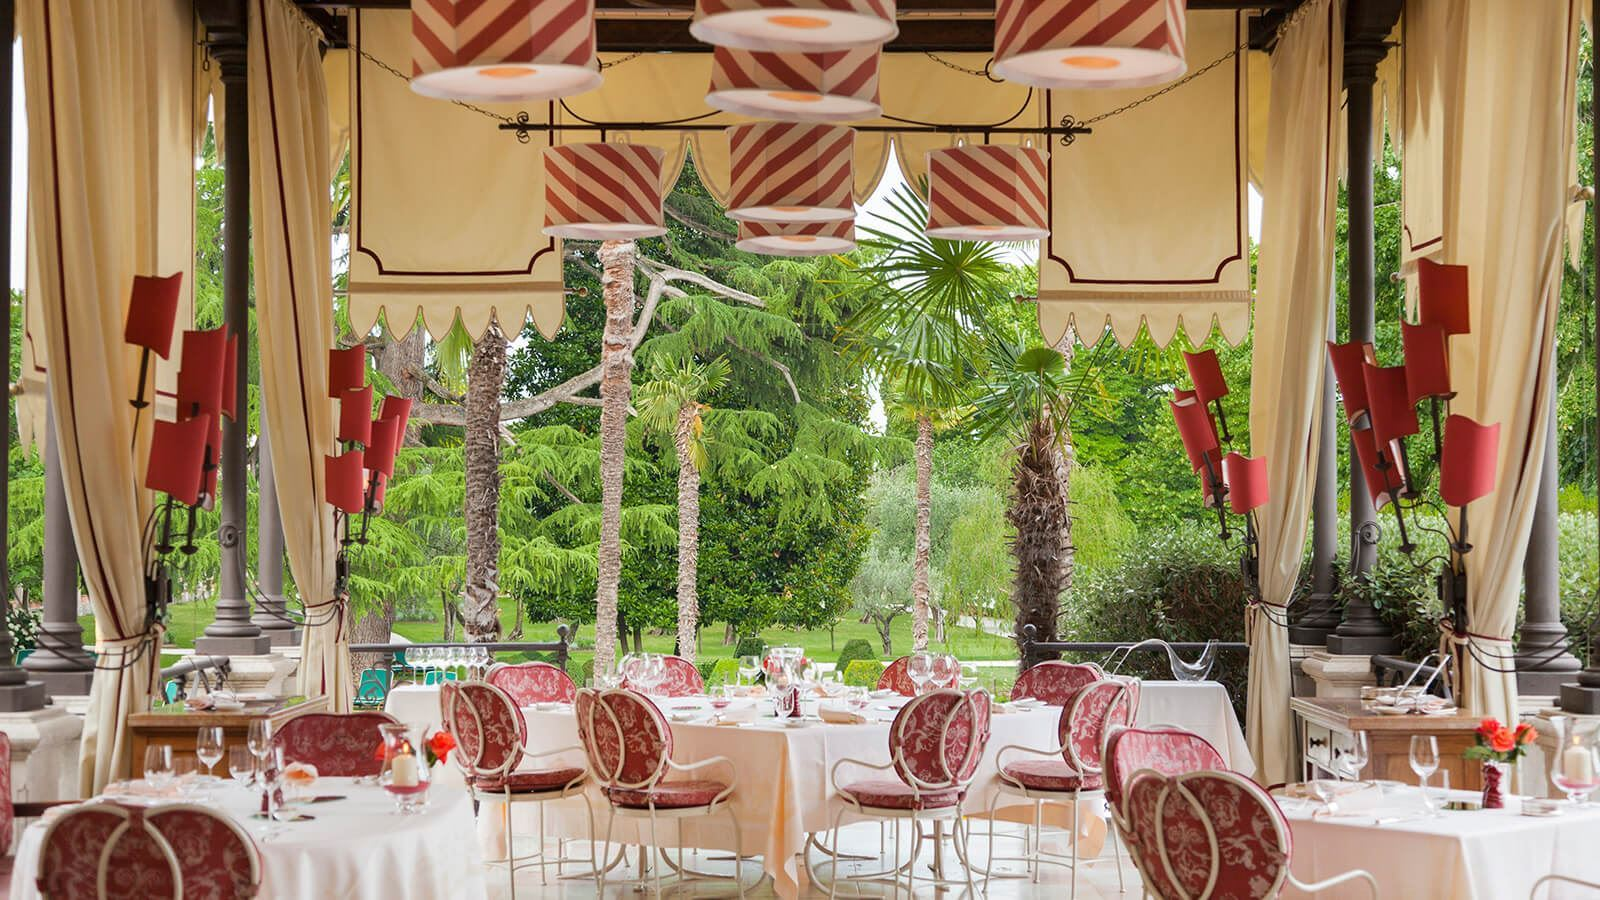 Grand-Hotel-Villa-Feltrinelli-Restaurant-08